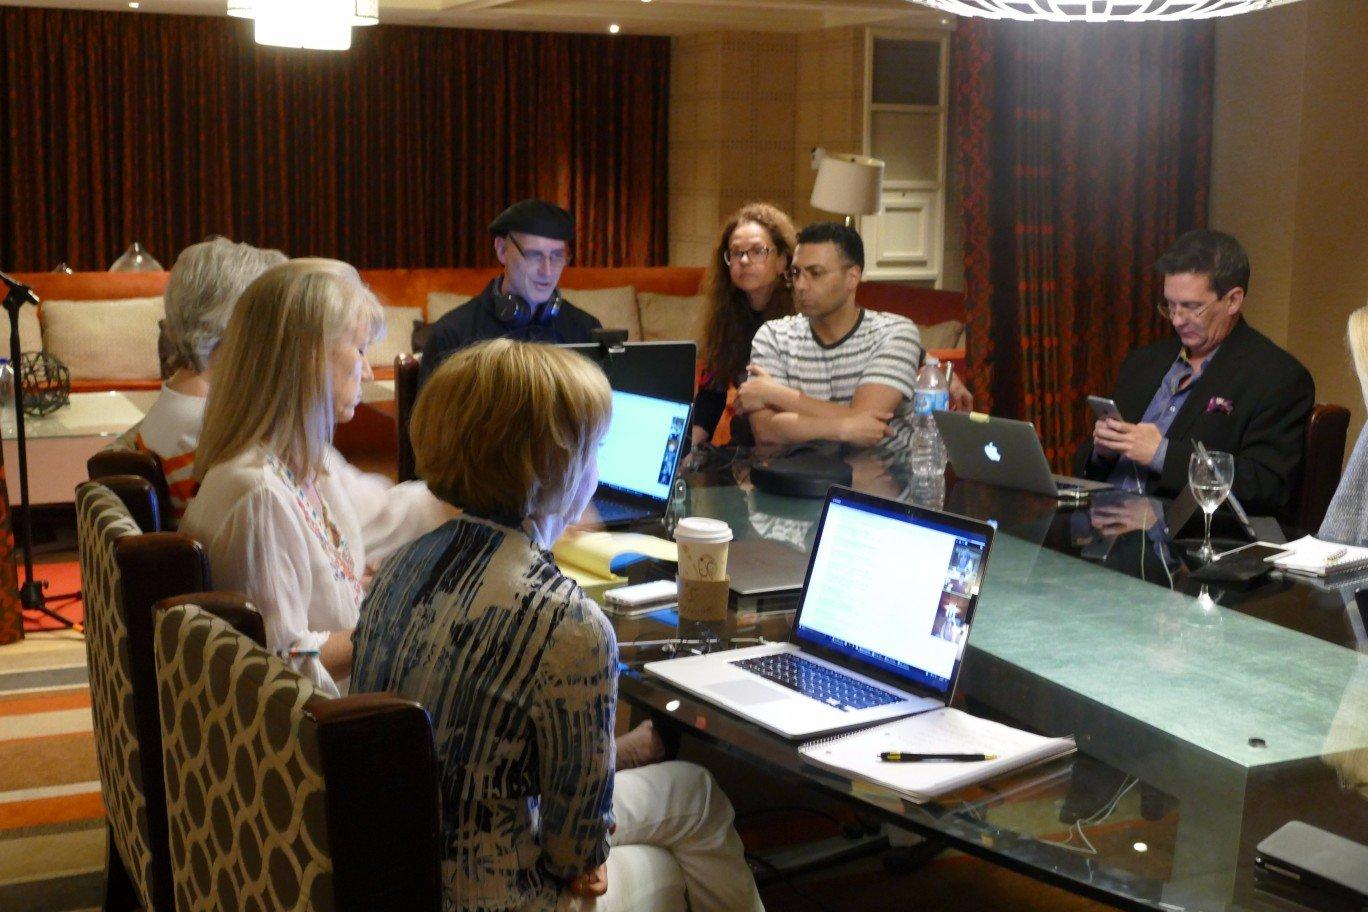 Media Planning | VipShowcase.com